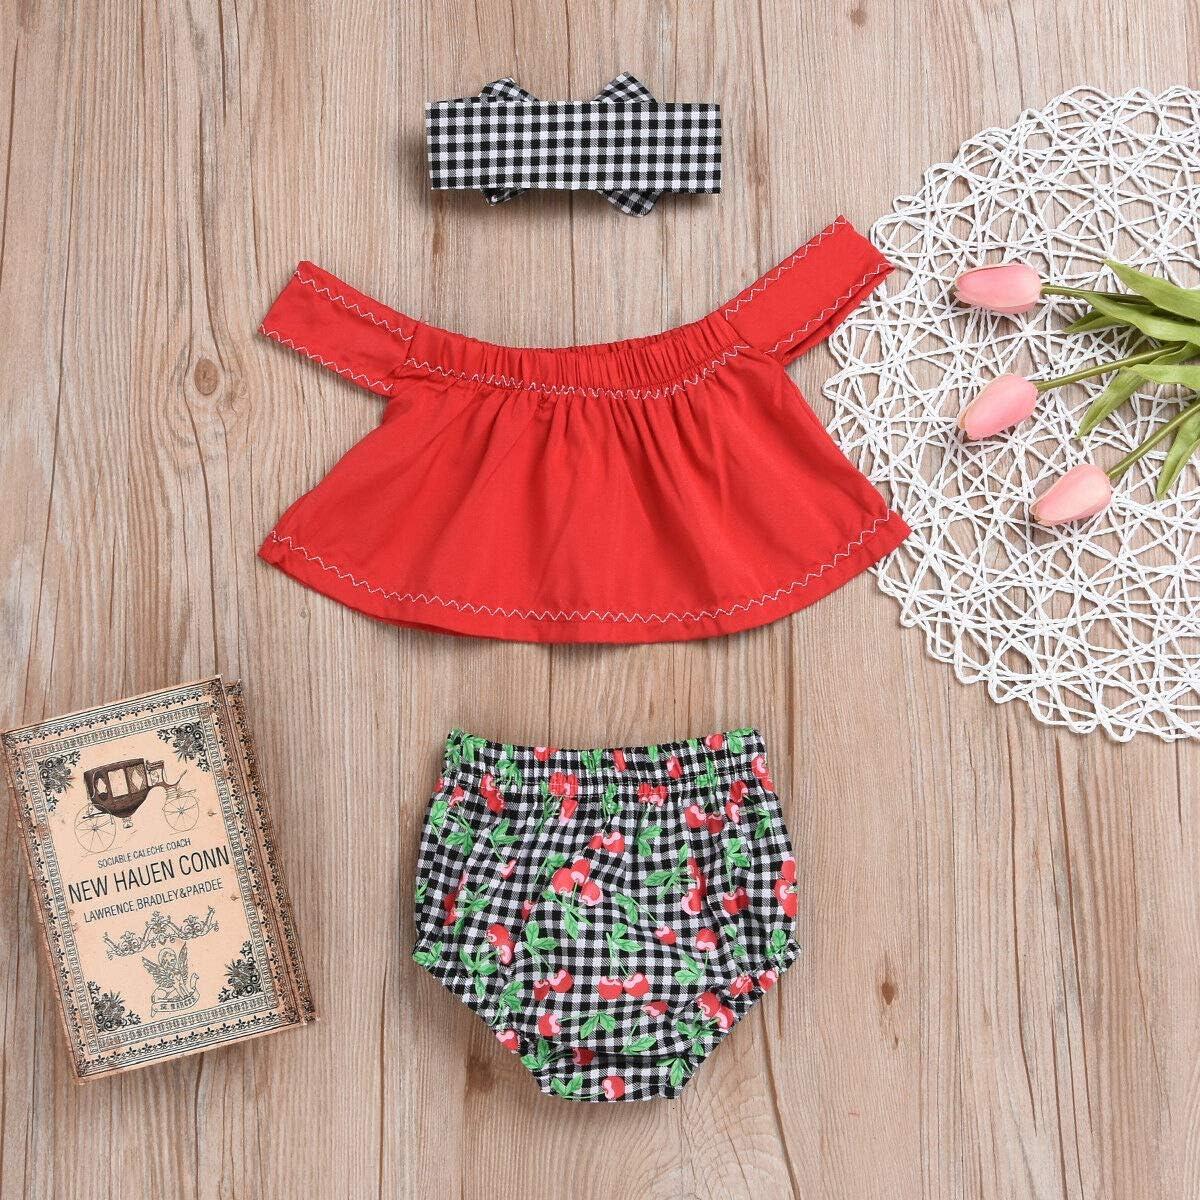 Bowknot Headband Outfit Set Cherry Shorts Pants 3PCS Newborn Baby Girl Tank Tops